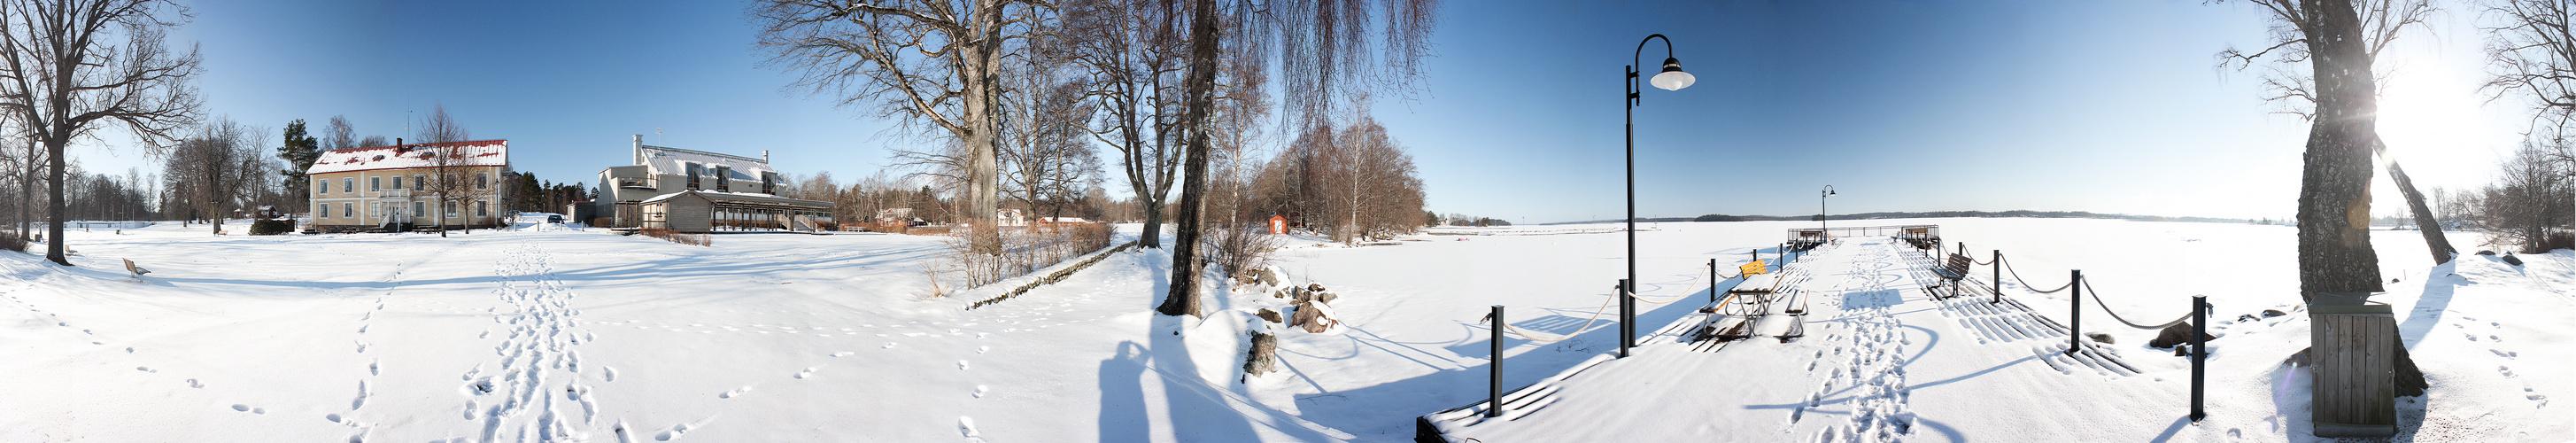 Evedal Panorama